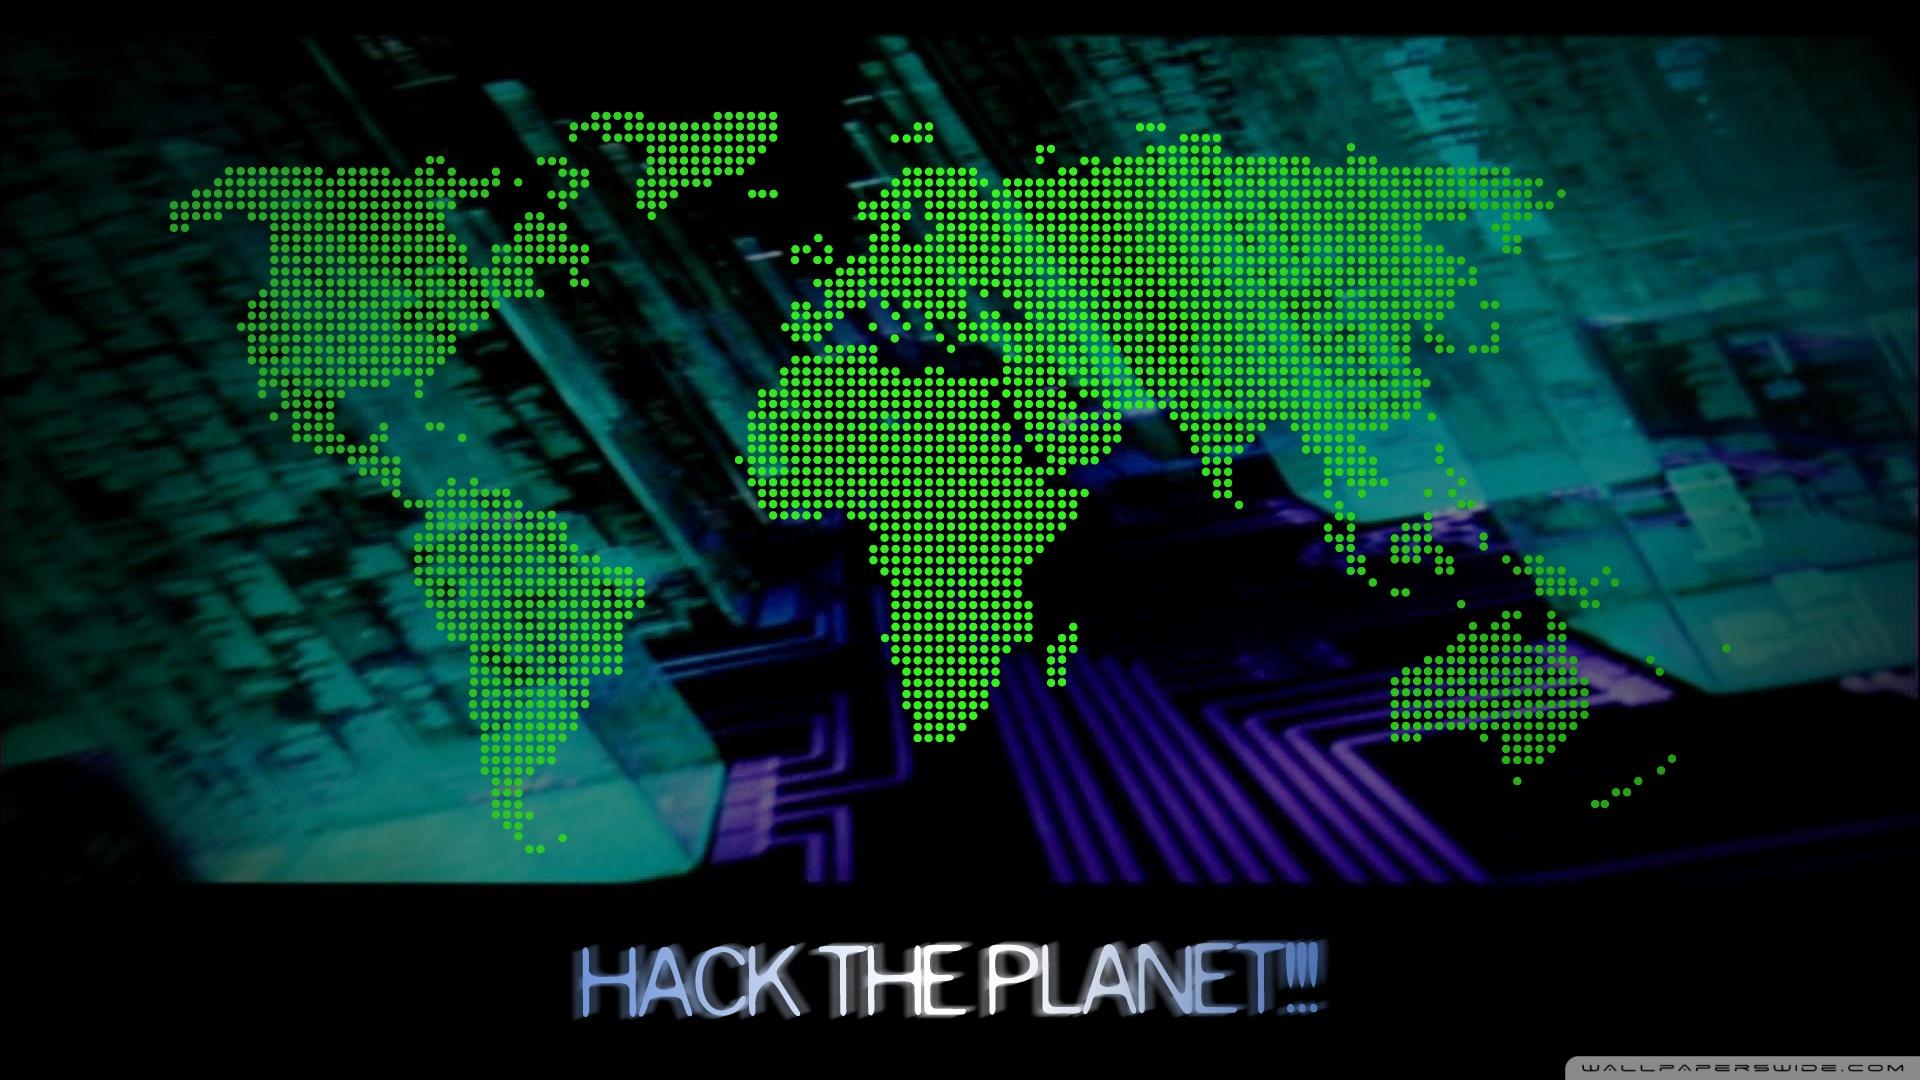 hack the planet ❤ uhd desktop wallpaper for ultra hd 4k 8k • mobile